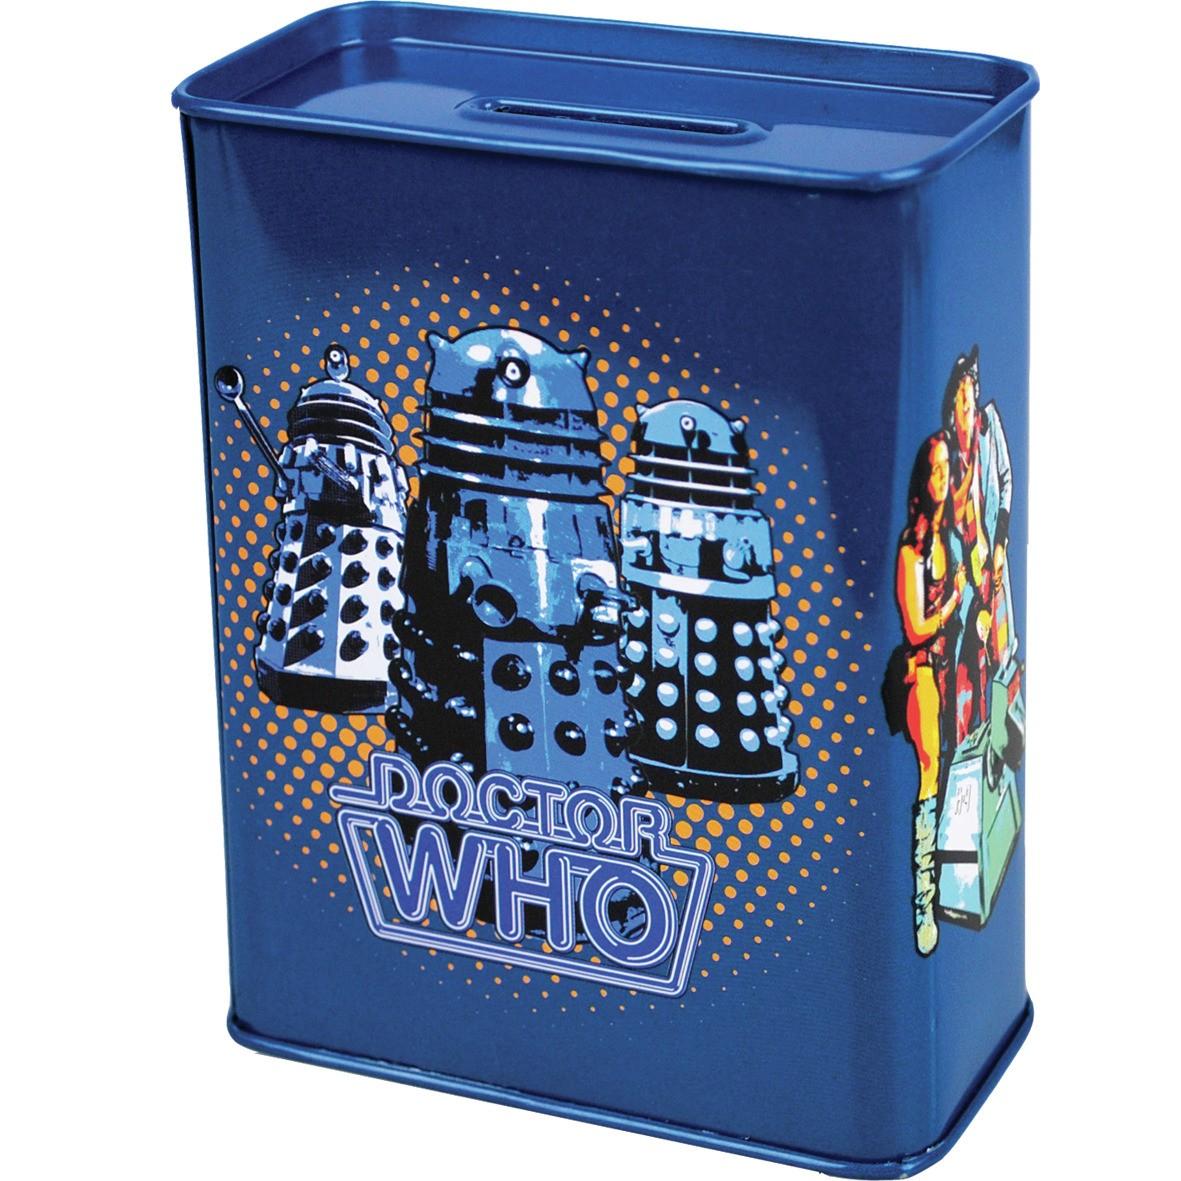 New doctor who metal money box tin piggy bank daleks k9 ebay - Tardis piggy bank ...